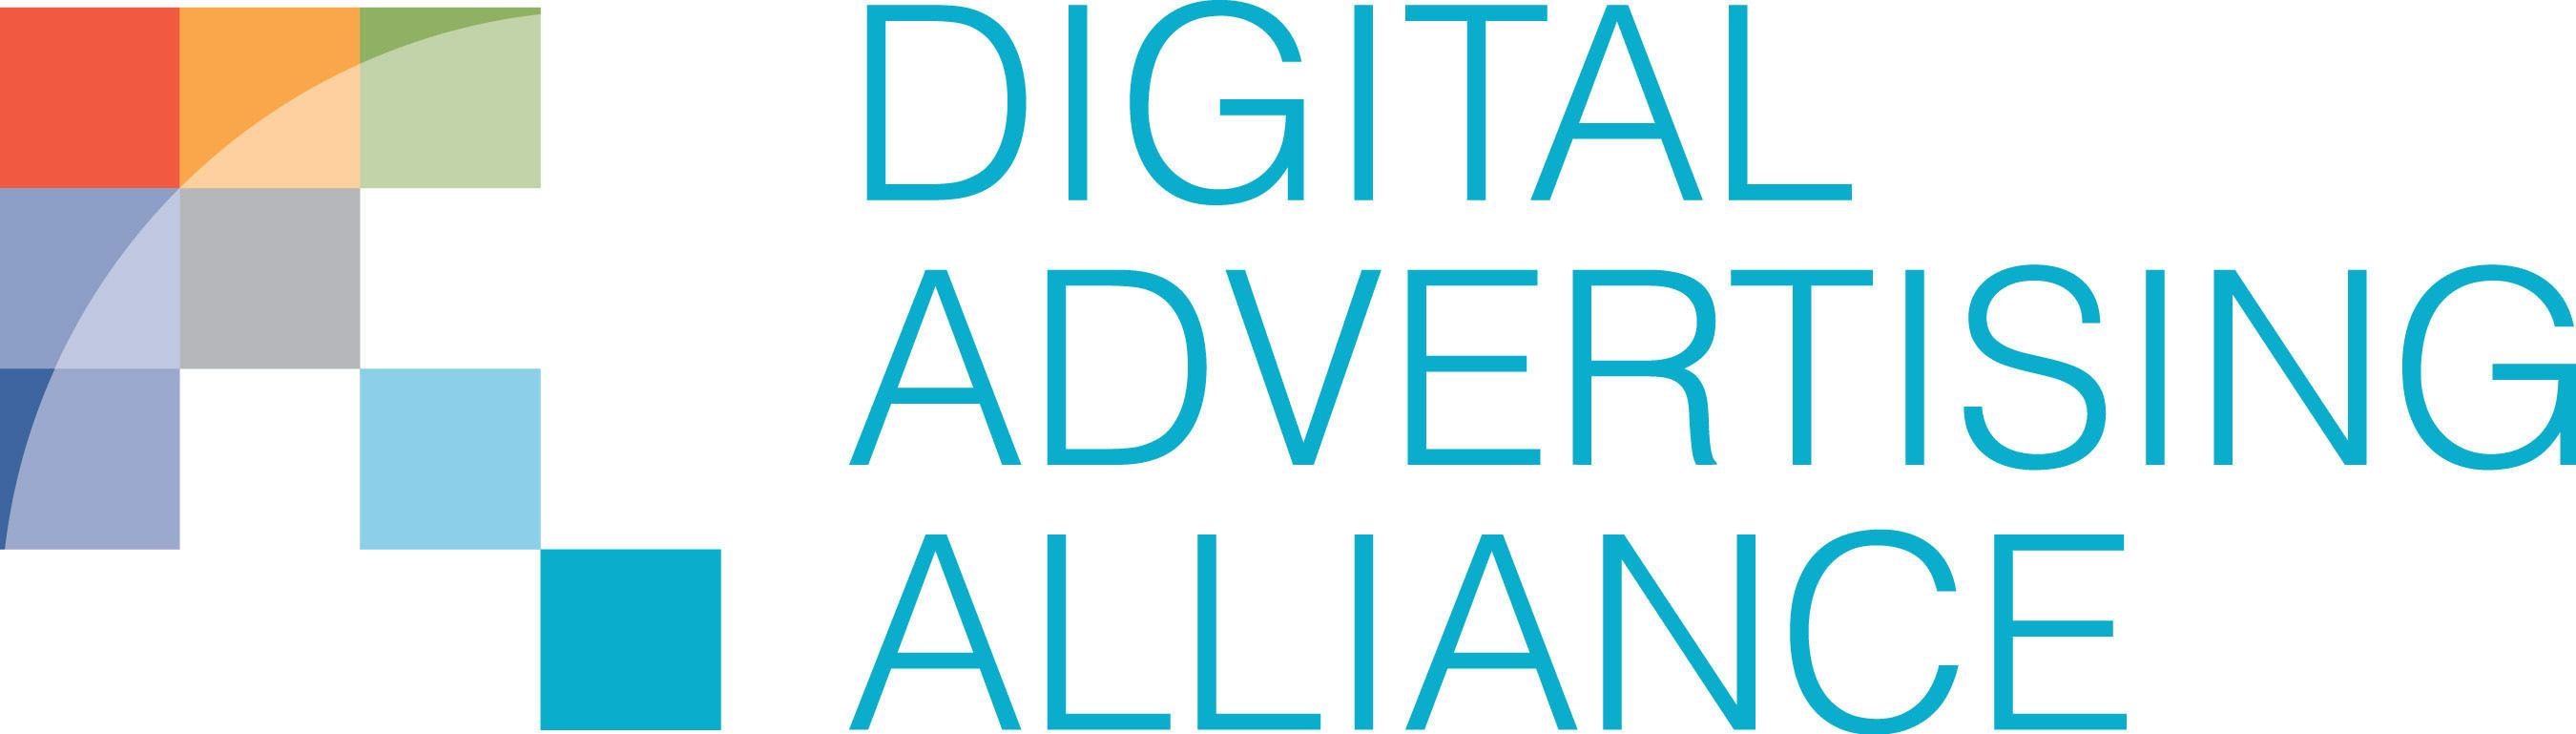 Digital Advertising Alliance (DAA).